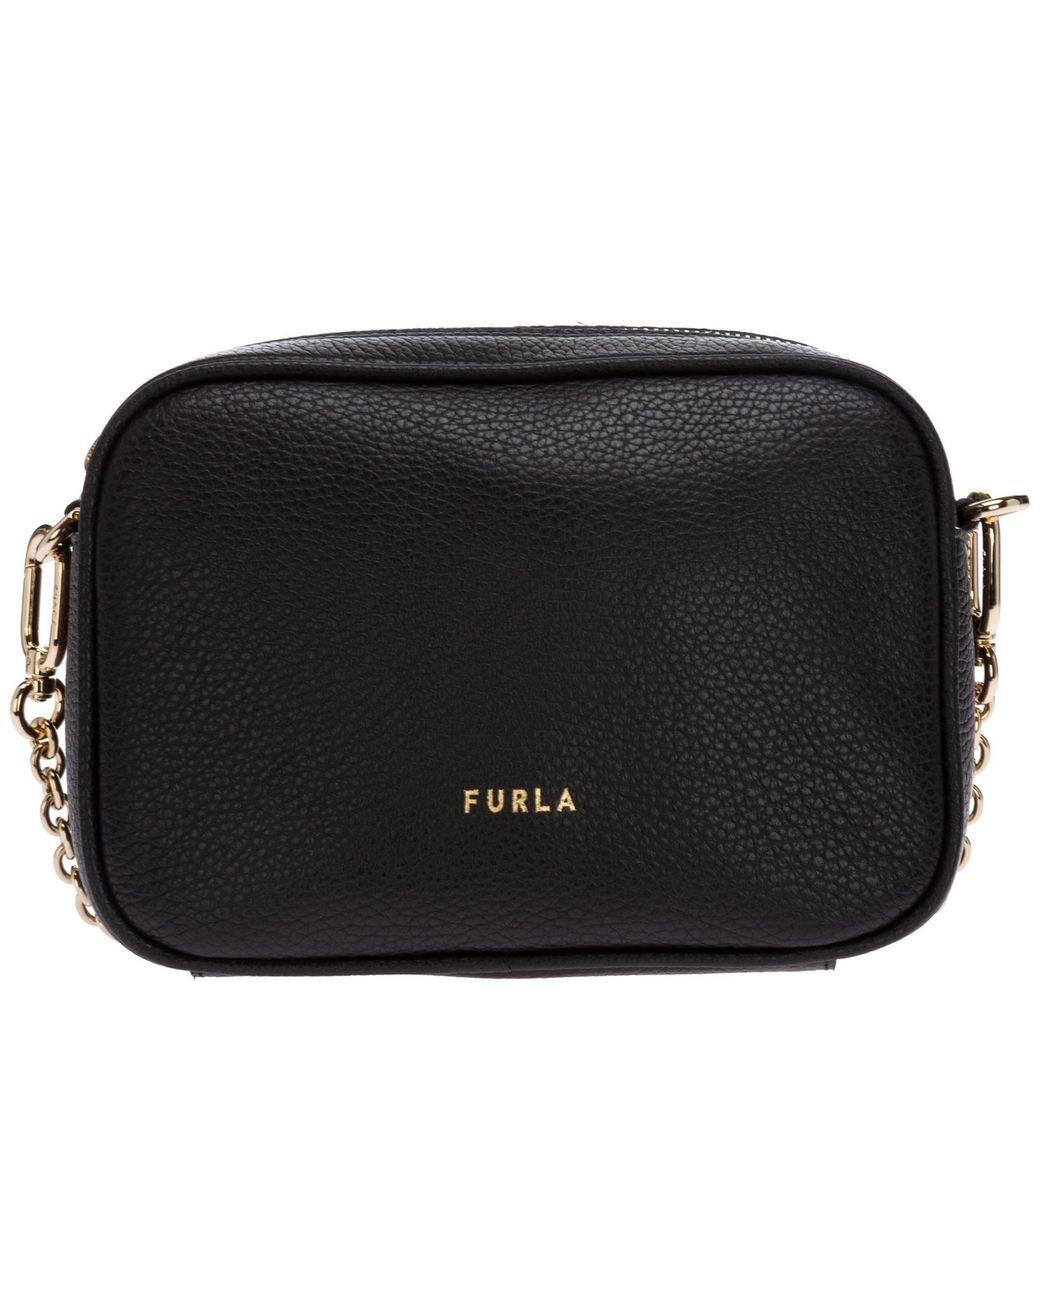 Woman crossbody bag Furla Real mini in black leather with